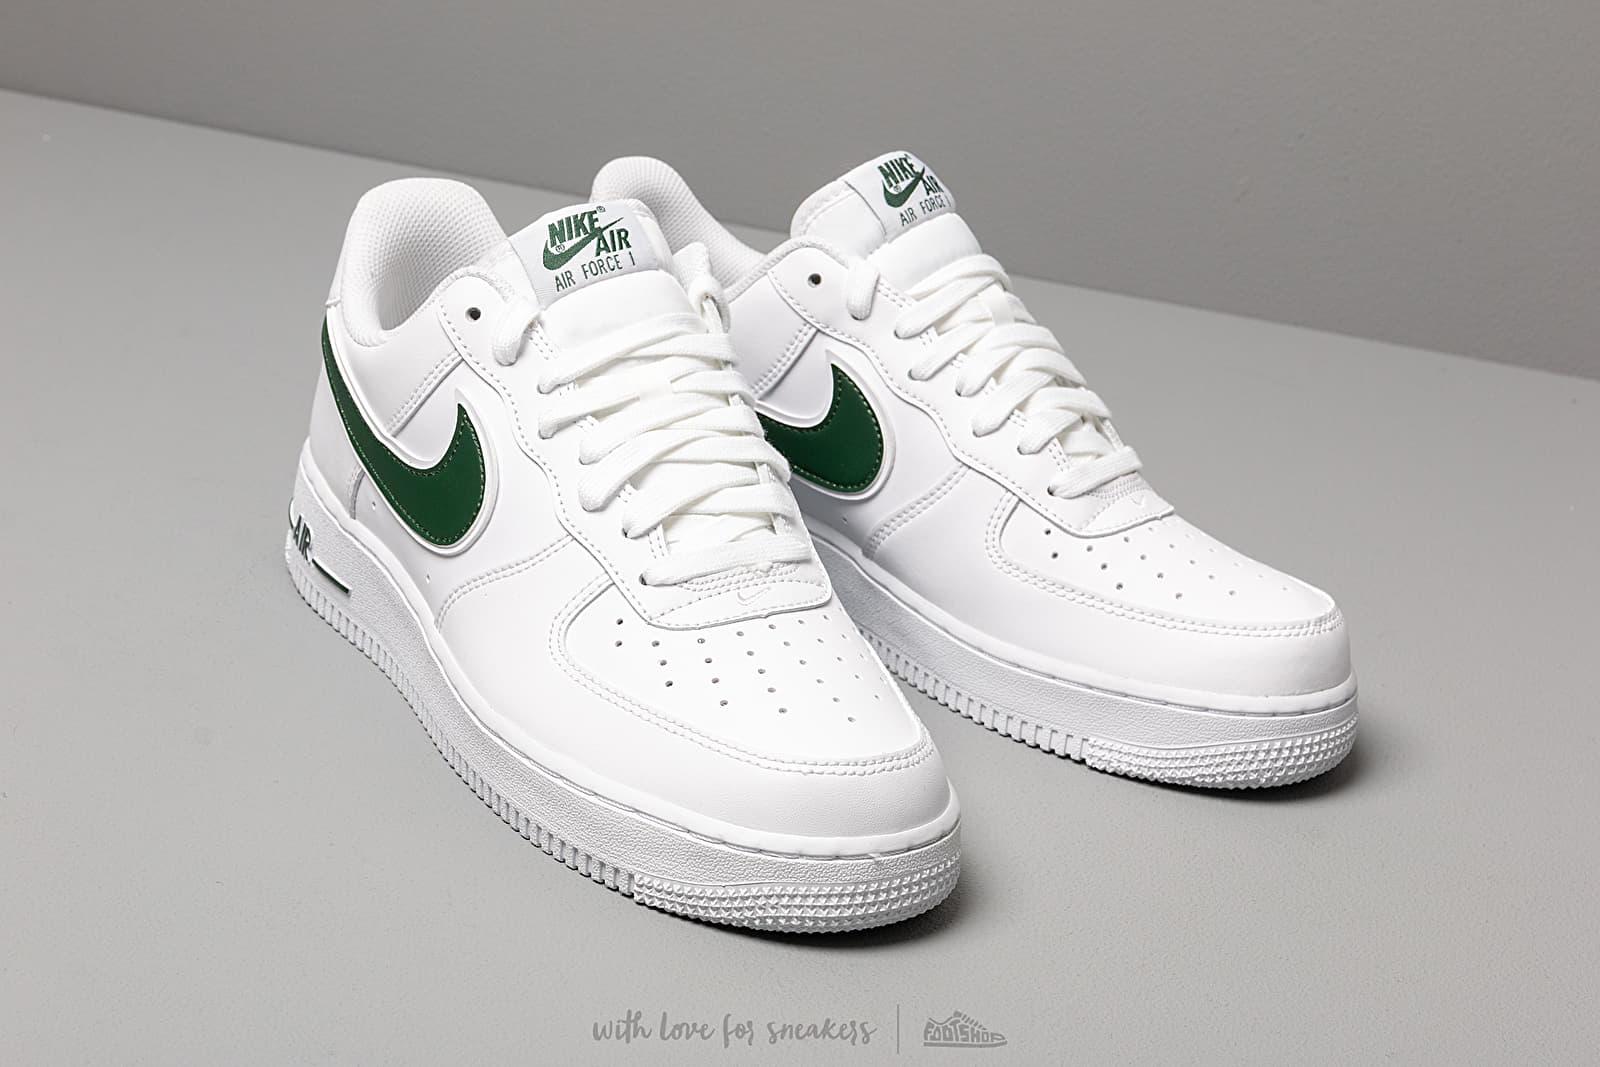 Nike Air Force 1 '07 3 White Cosmic Bonsai | Footshop